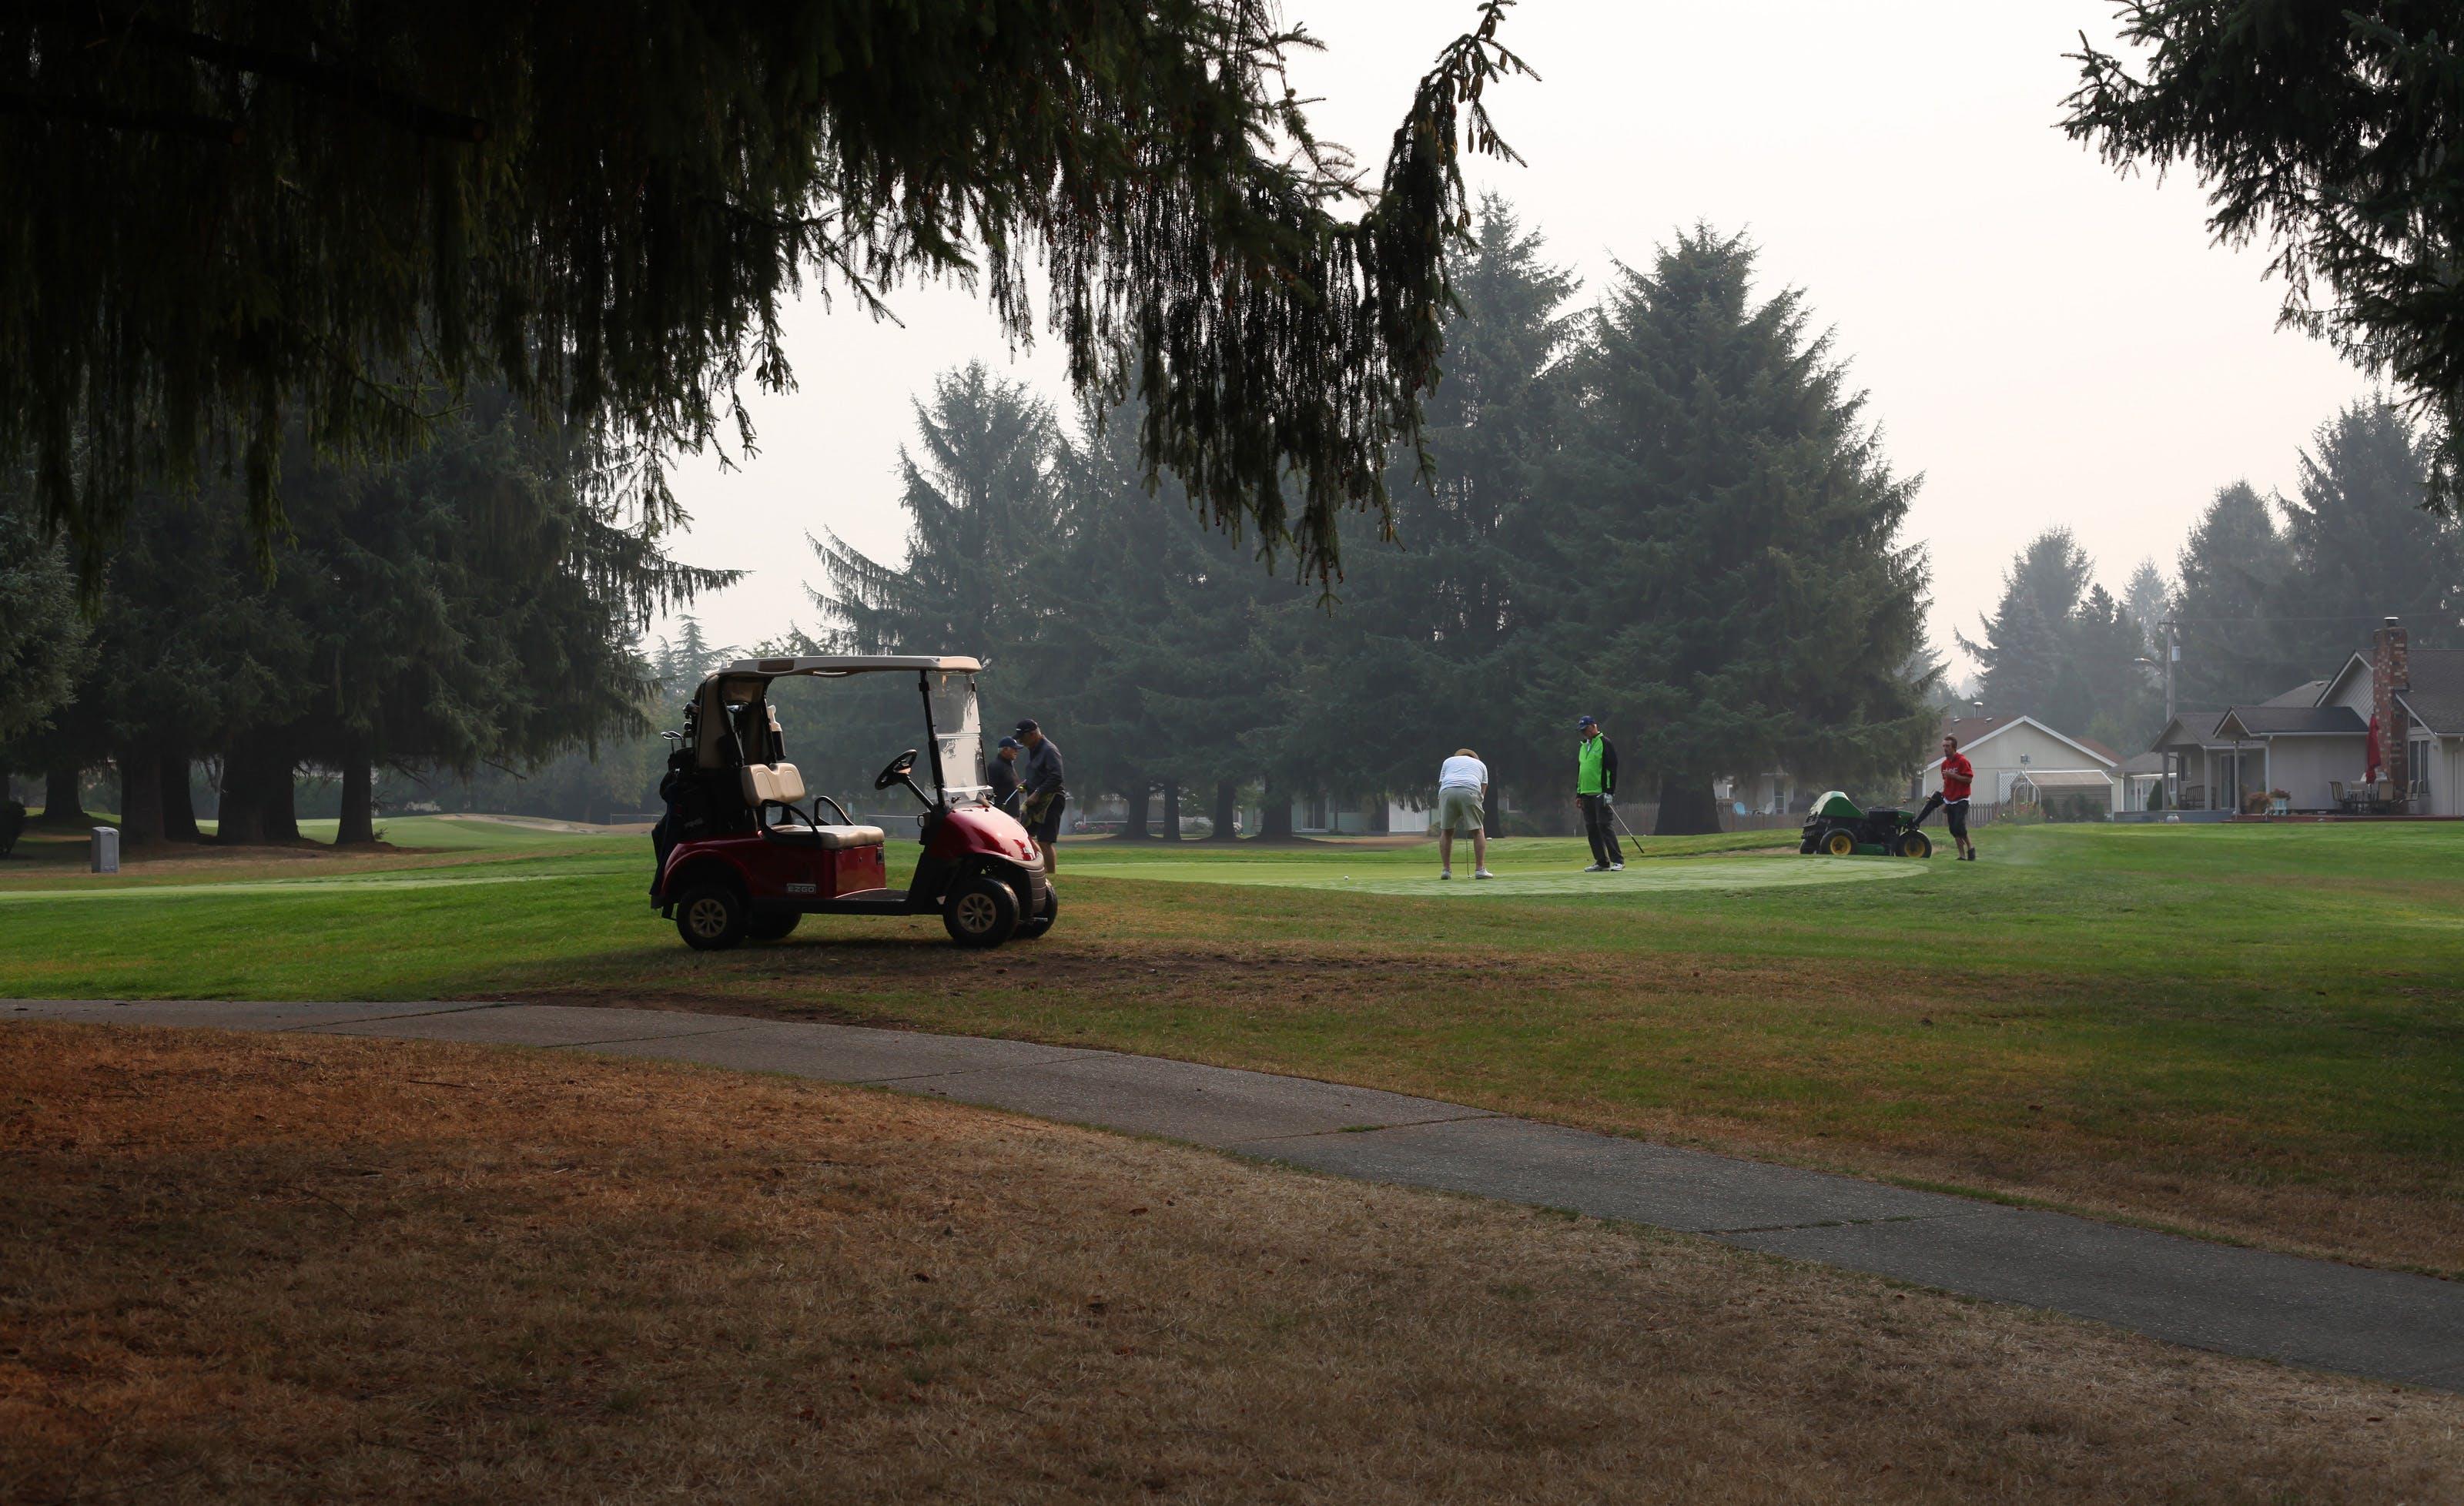 Free stock photo of golf cart trees